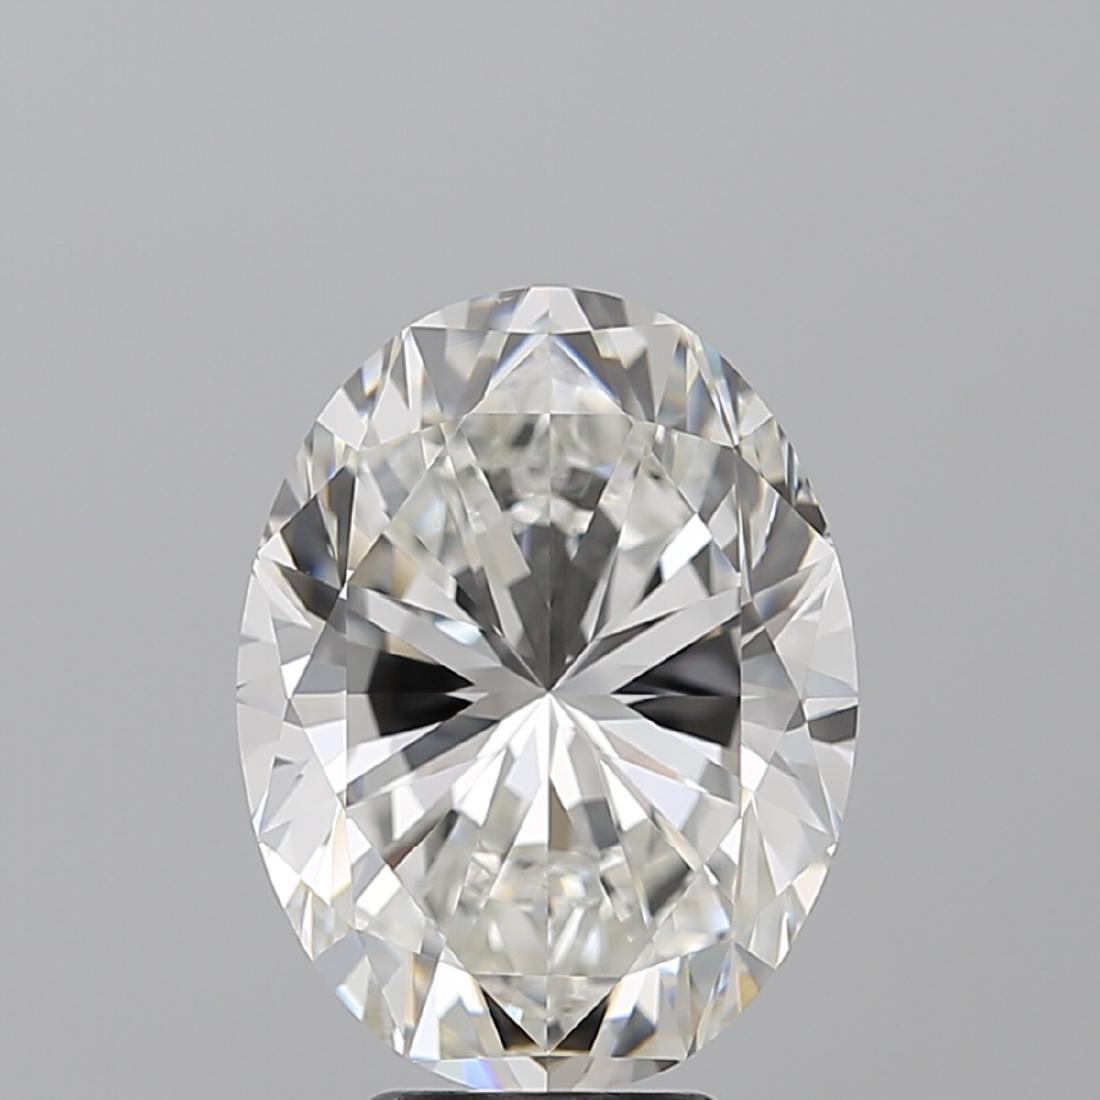 6.01 ct, Color G/VS1, Oval cut Diamond - 2